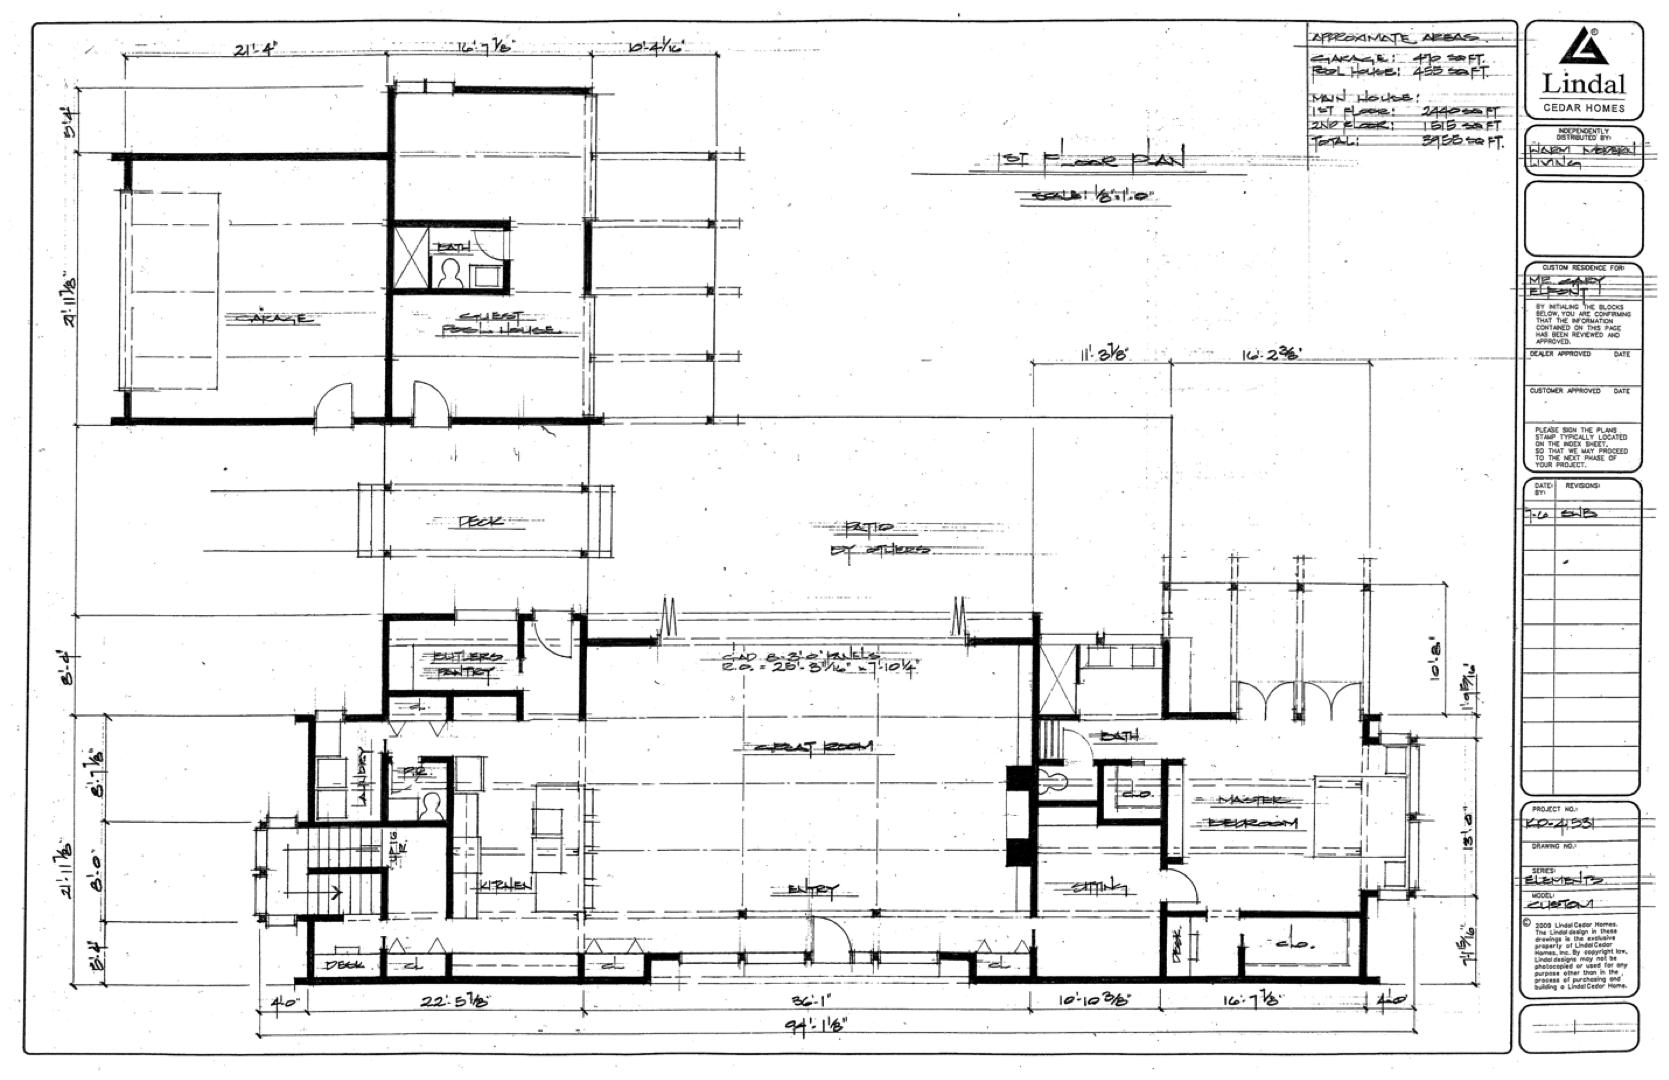 Lindal design development plan (July)